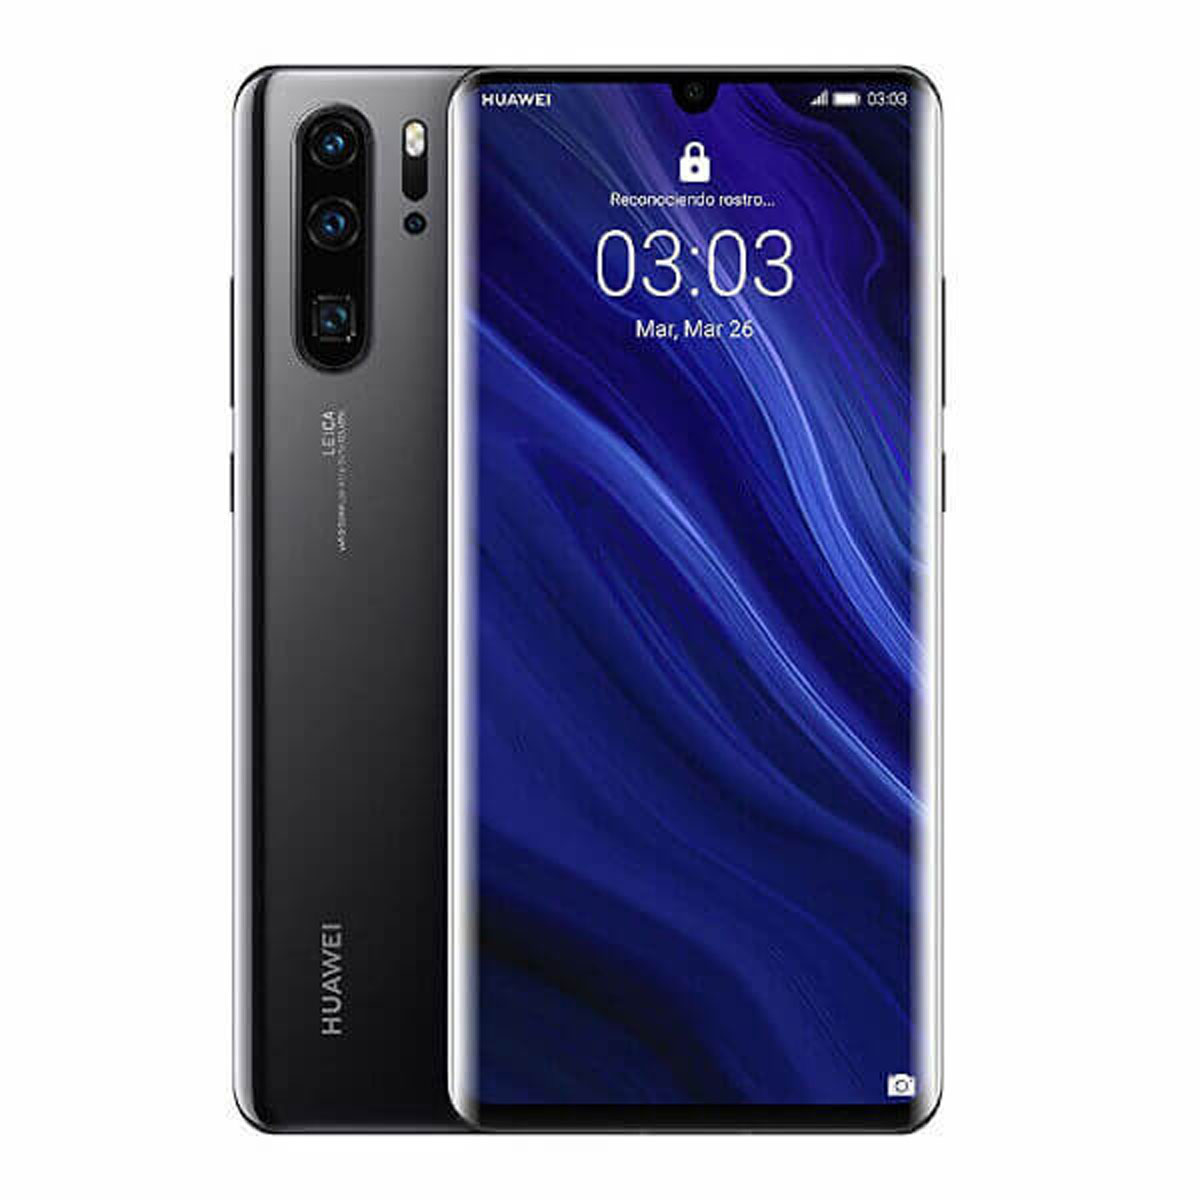 Huawei p30 pro 8gb/128gb black dual